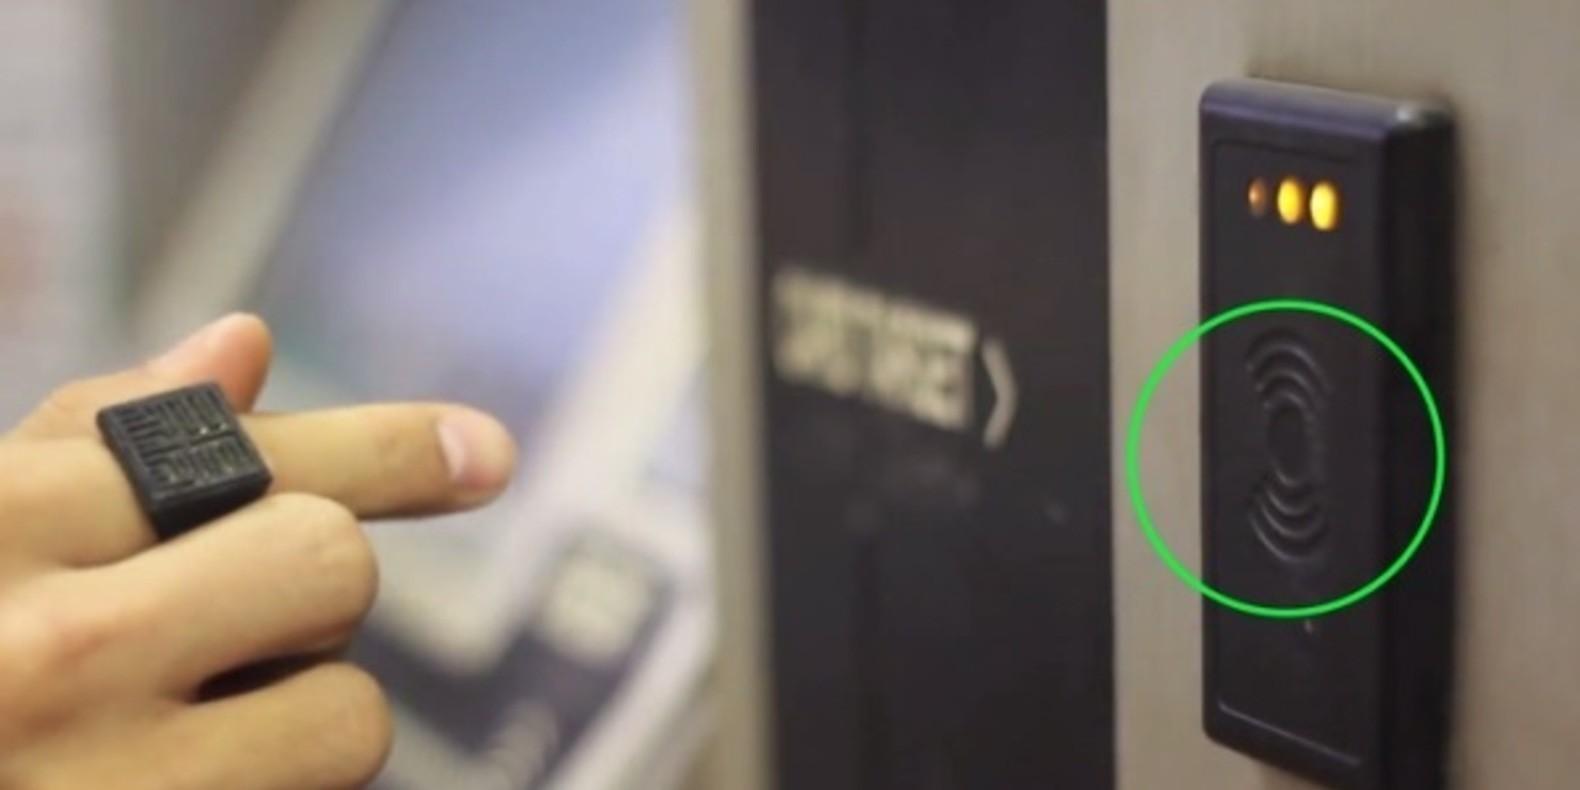 sesame ring theory 3D printed bague imprimée en 3D cults3D fichier 3D kickstarter boston MIT 5